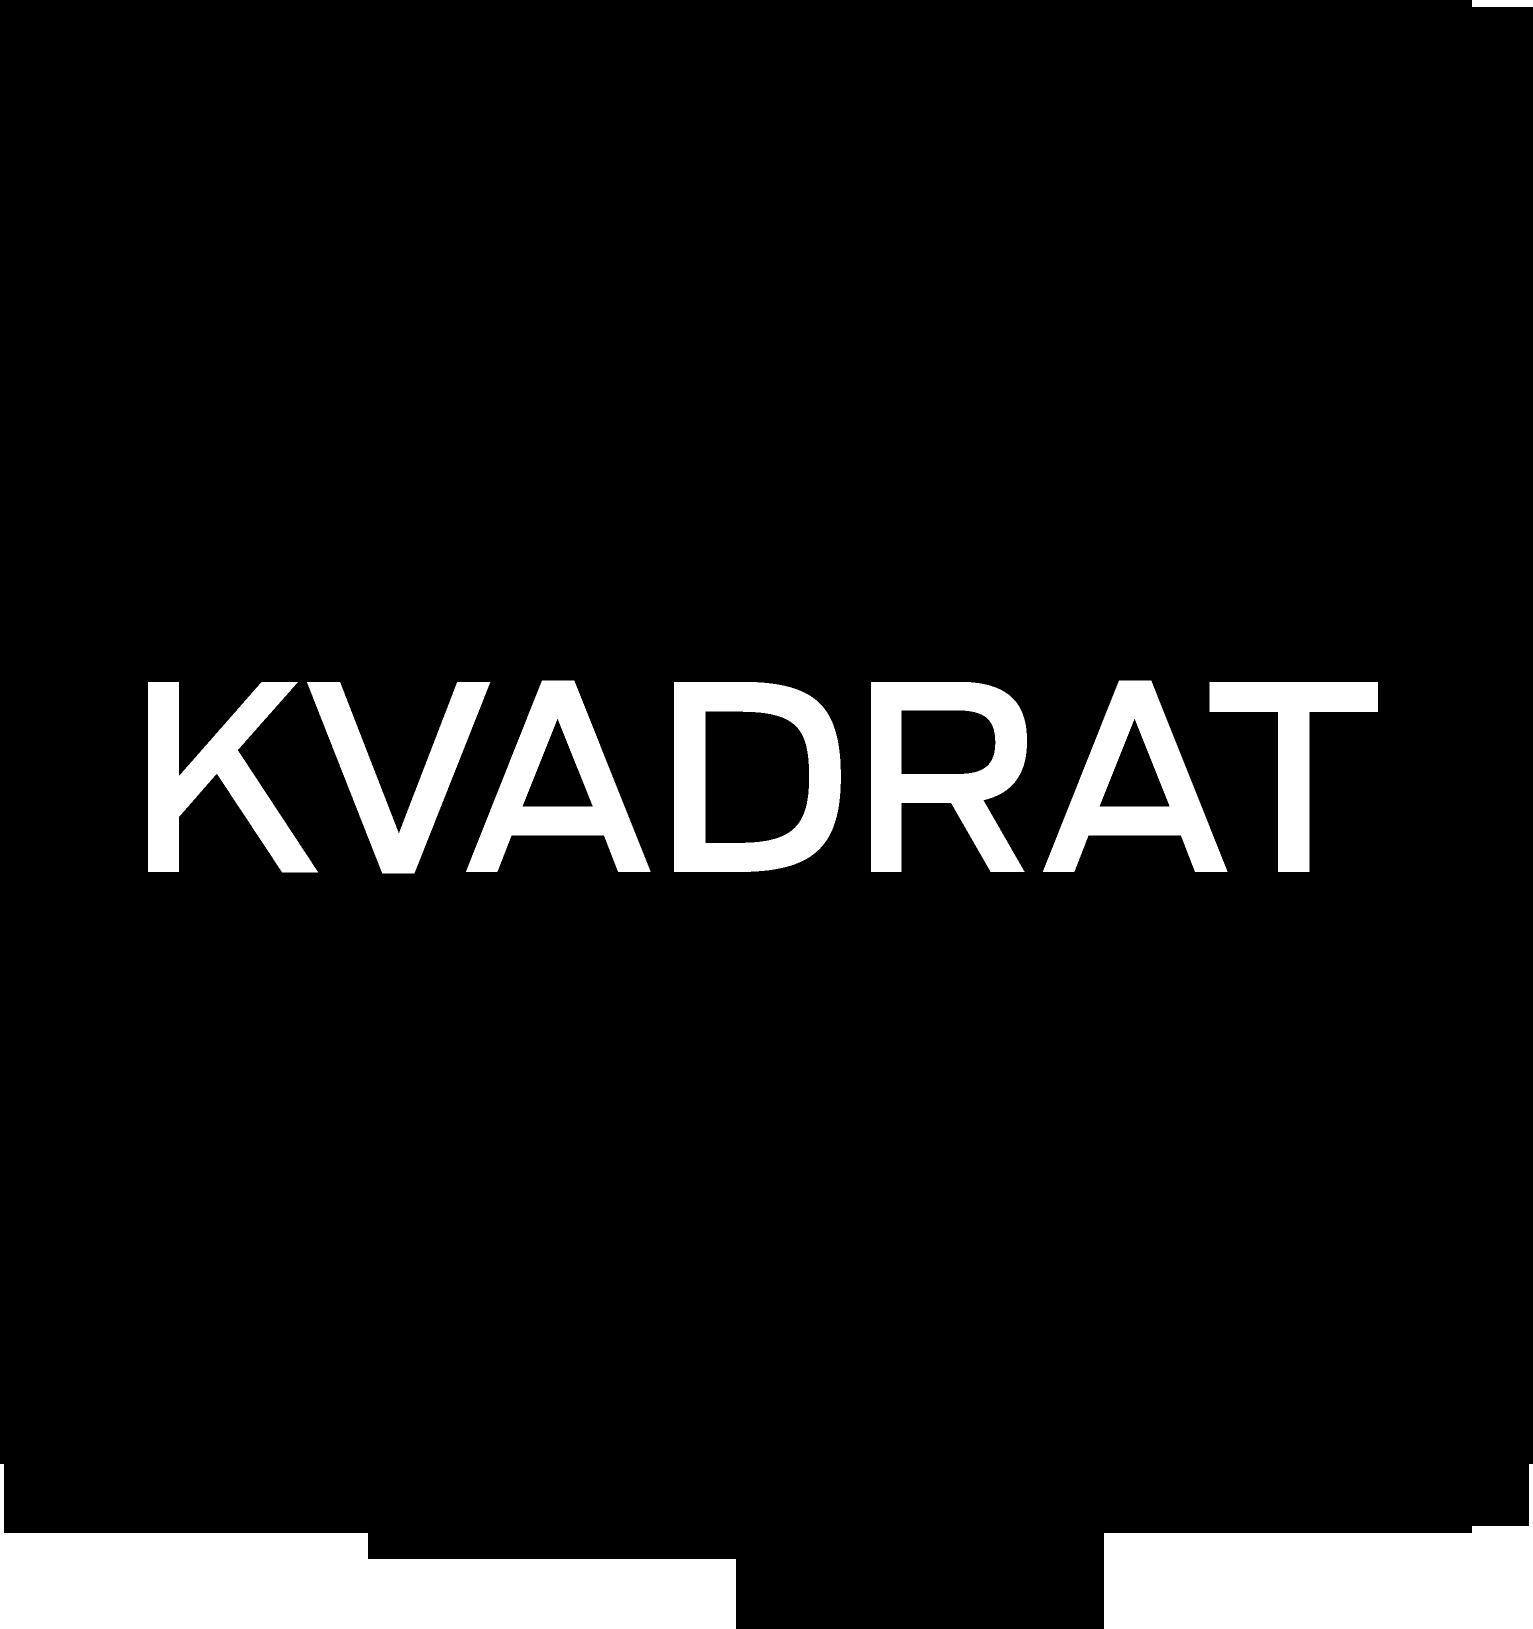 Kvadrat_logo (1)